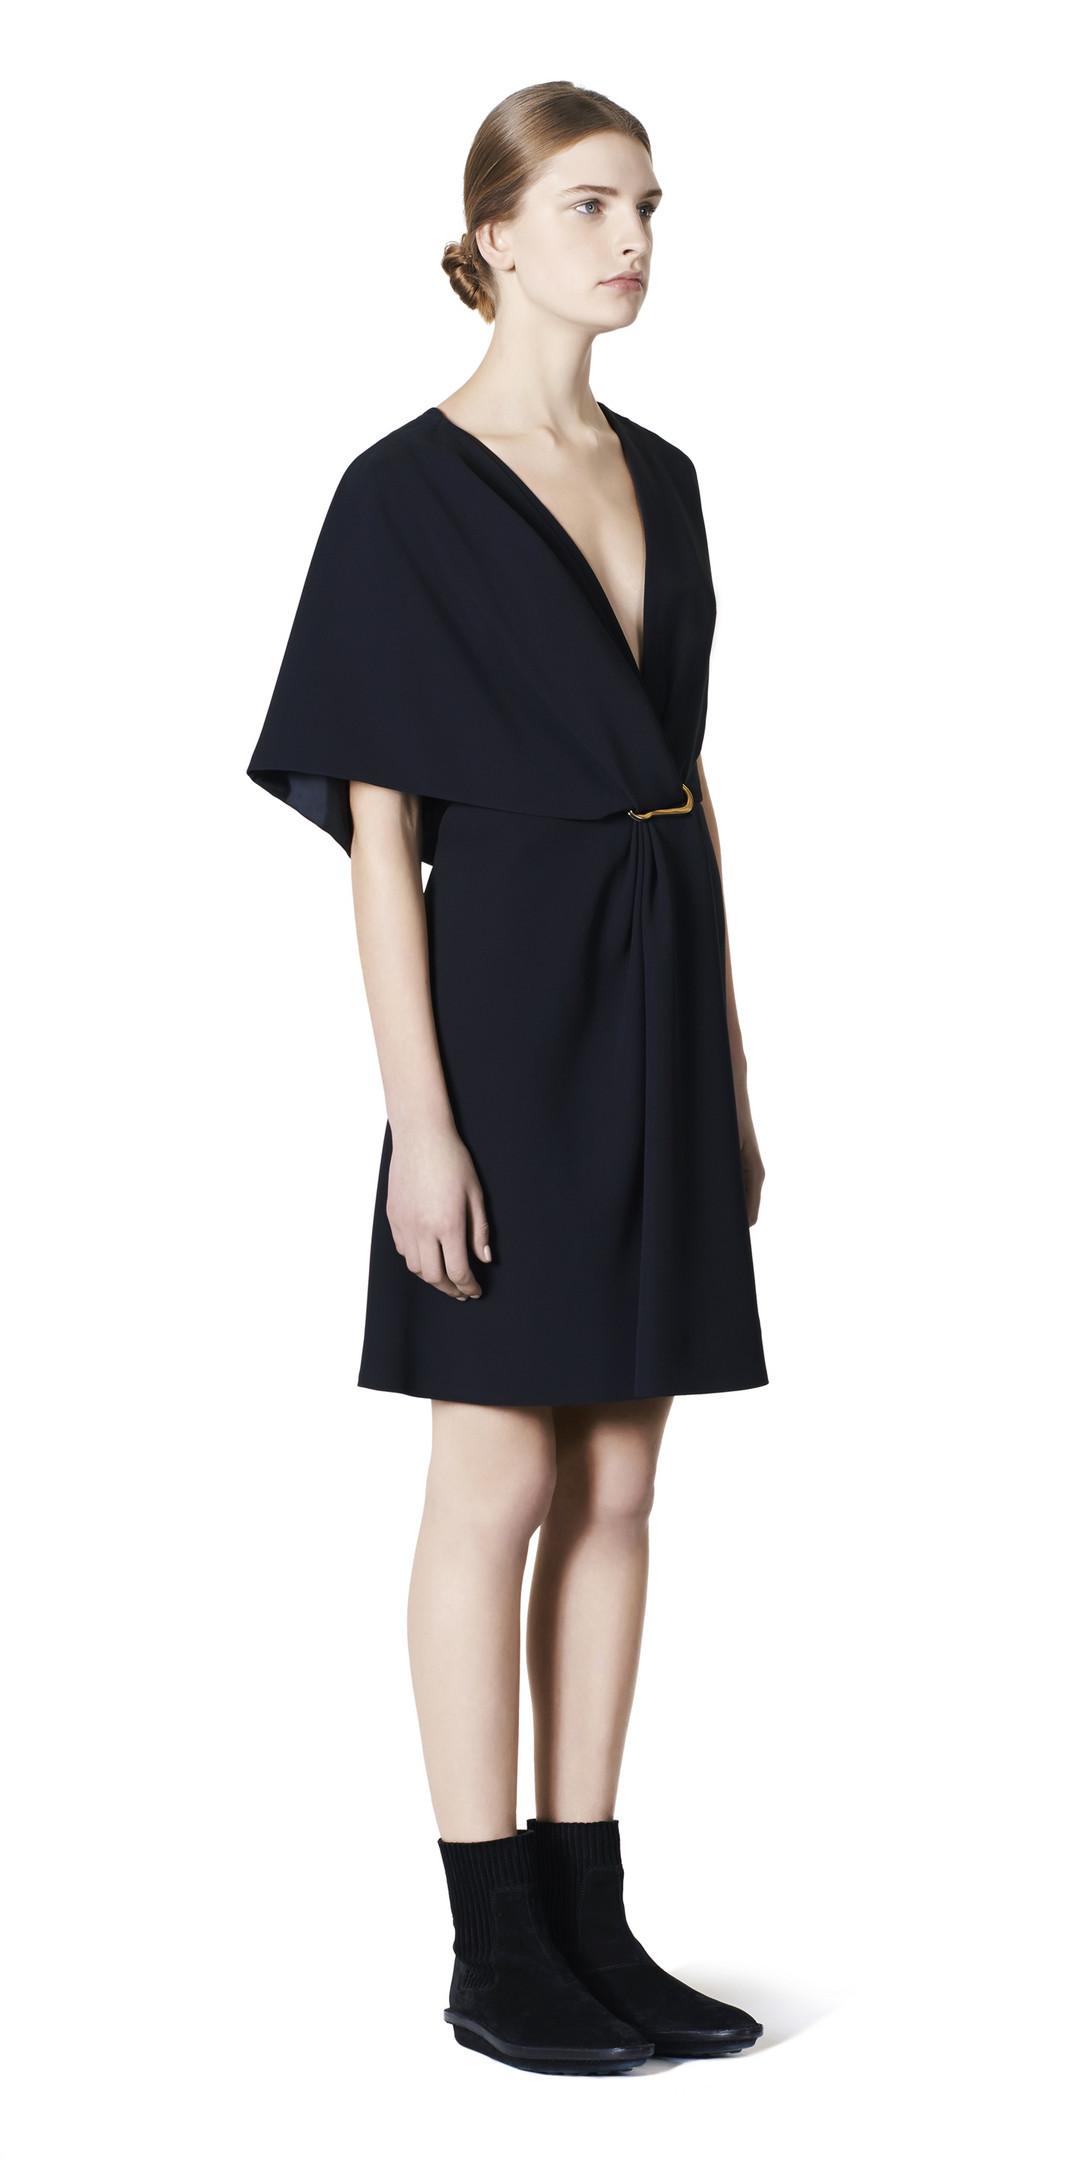 BALENCIAGA Balenciaga Carabiner Dress Dress D f